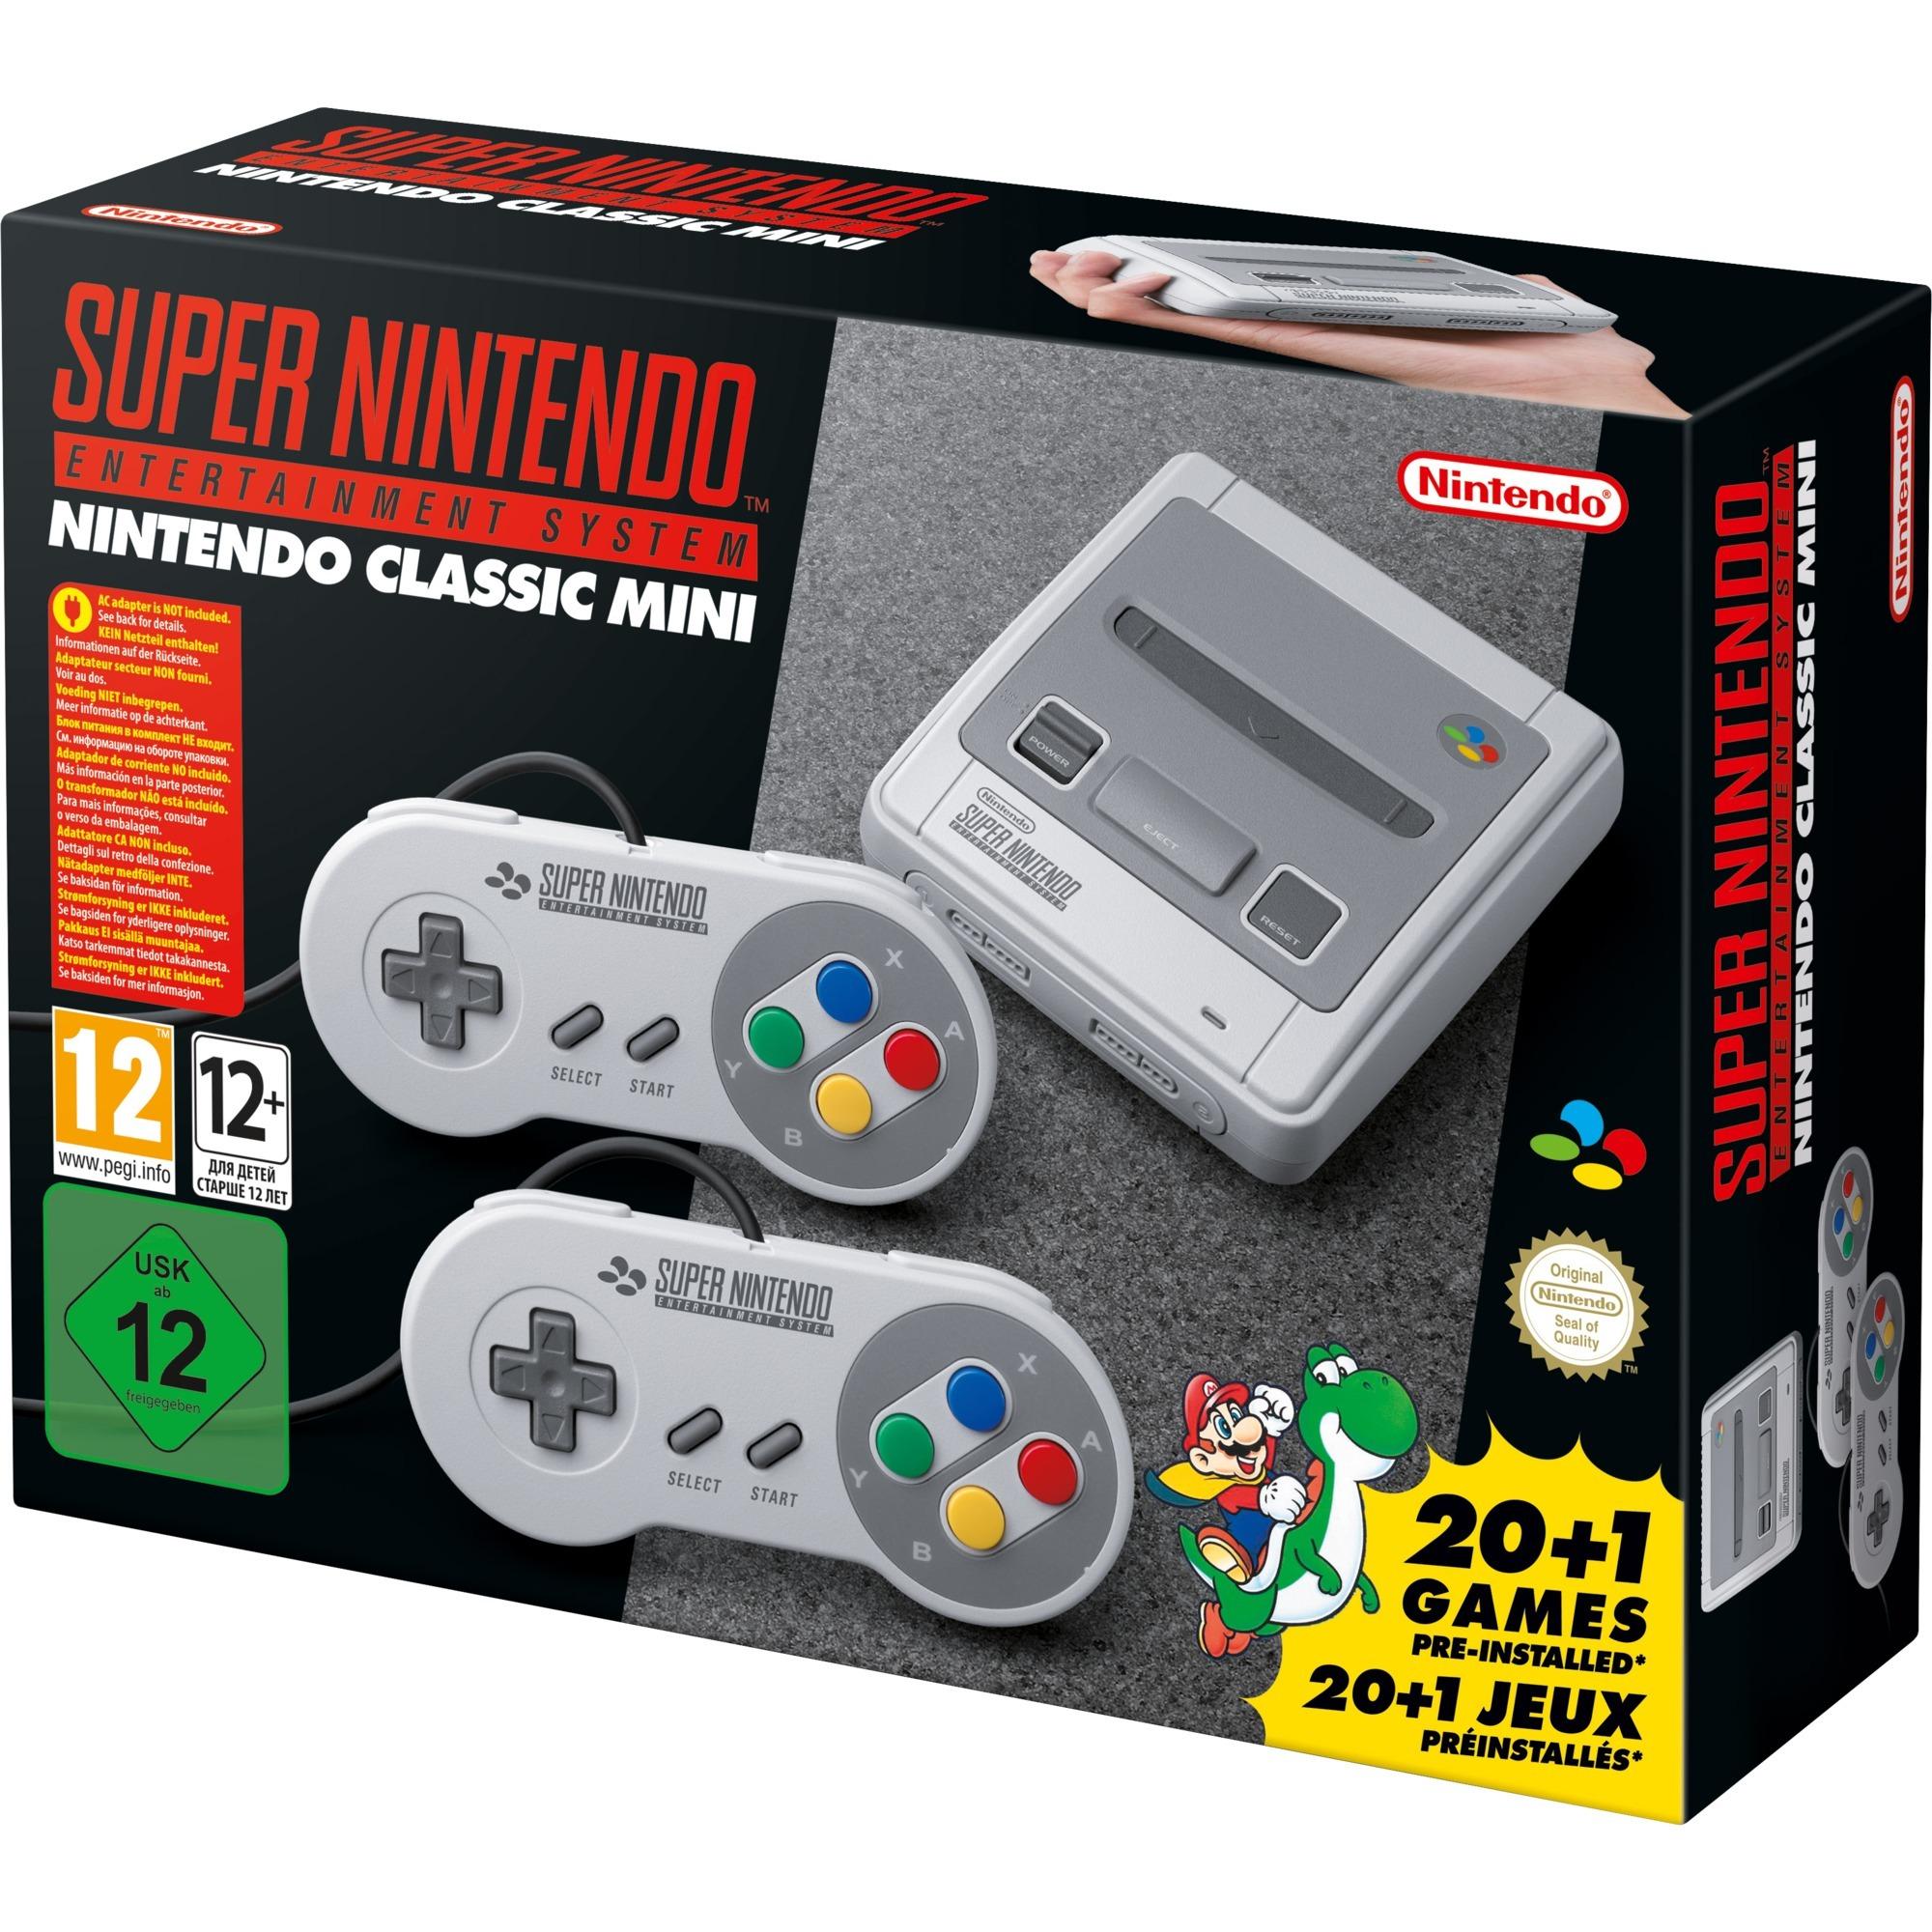 Classic Mini: Super Entertainment System Gris, Videoconsola